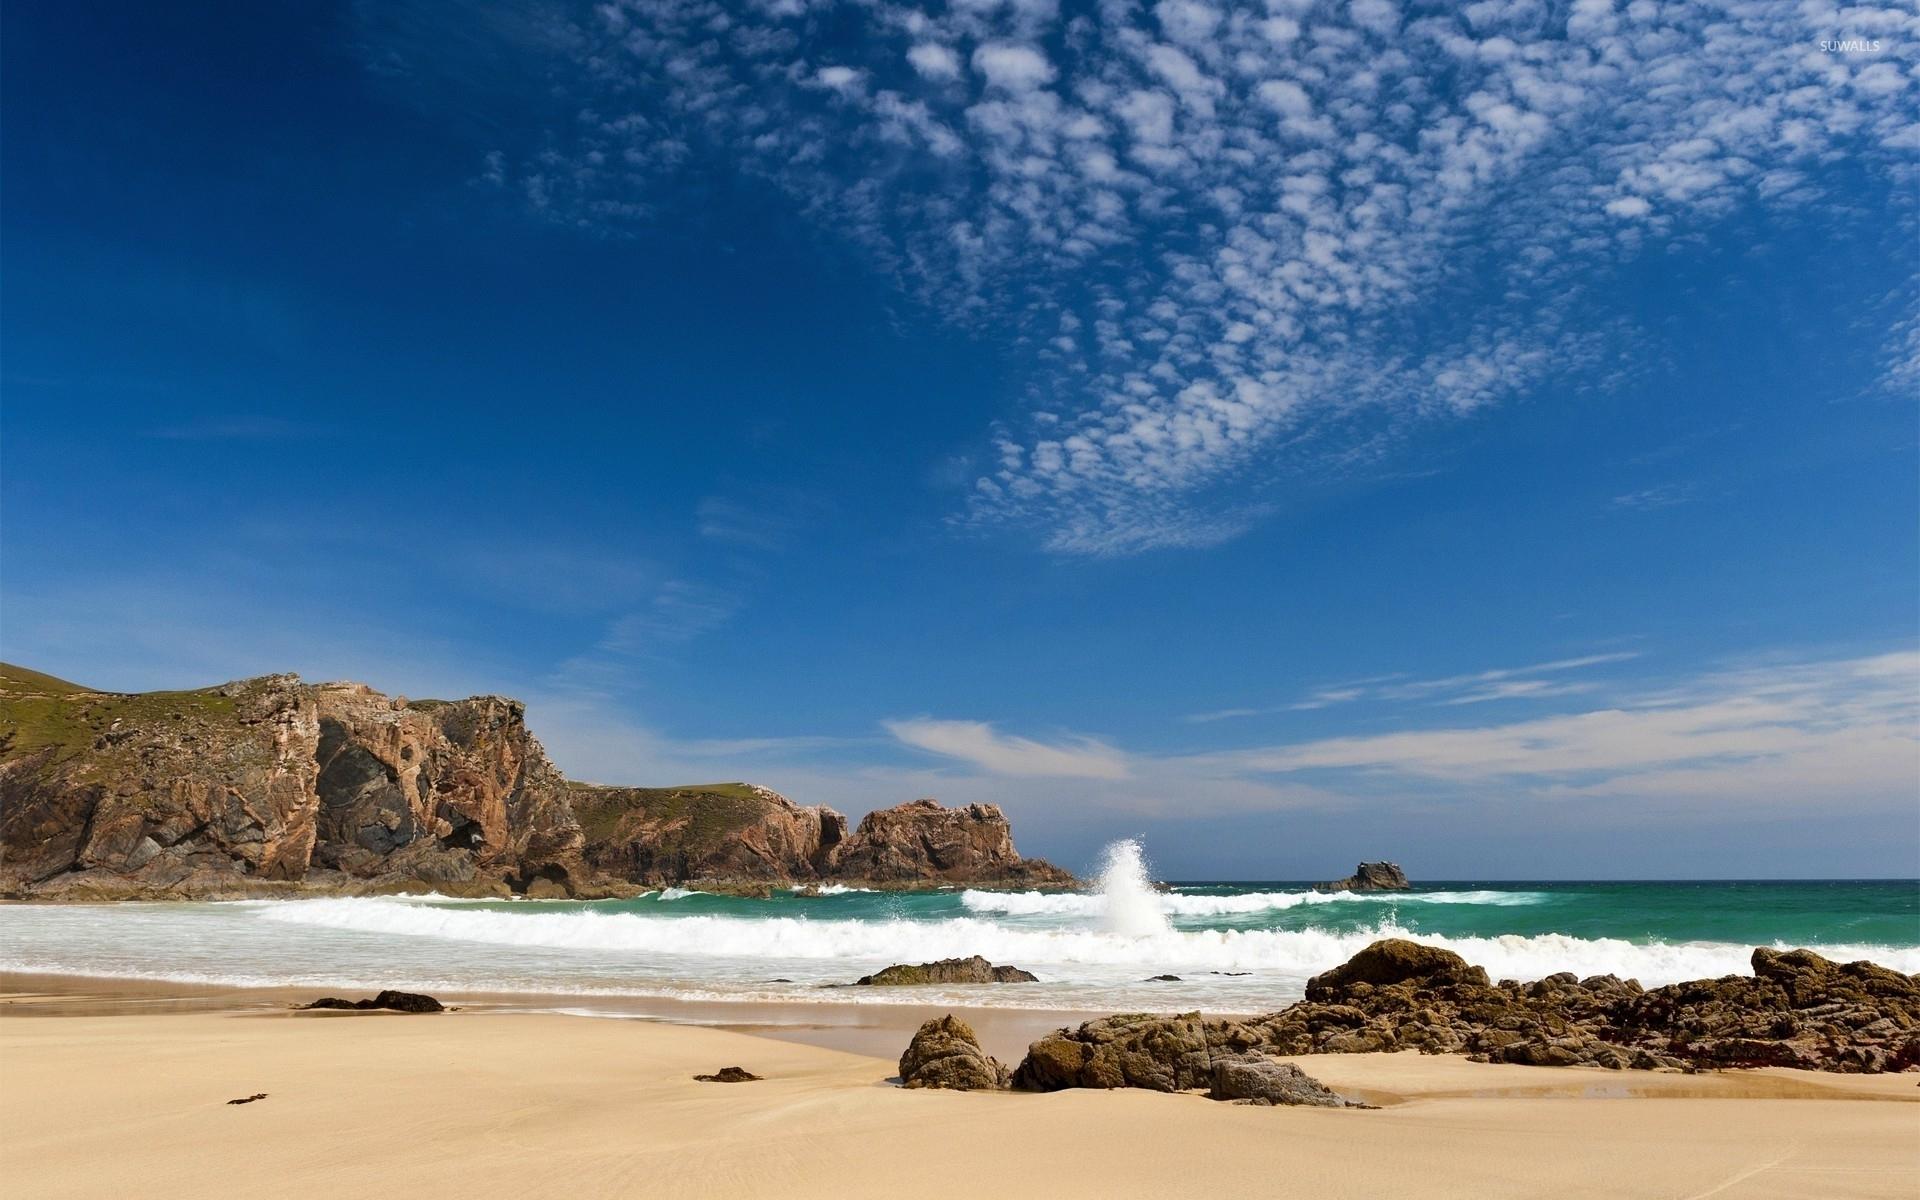 Sandy Beach Wallpaper: Waves Splashing On A Sandy Beach Wallpaper